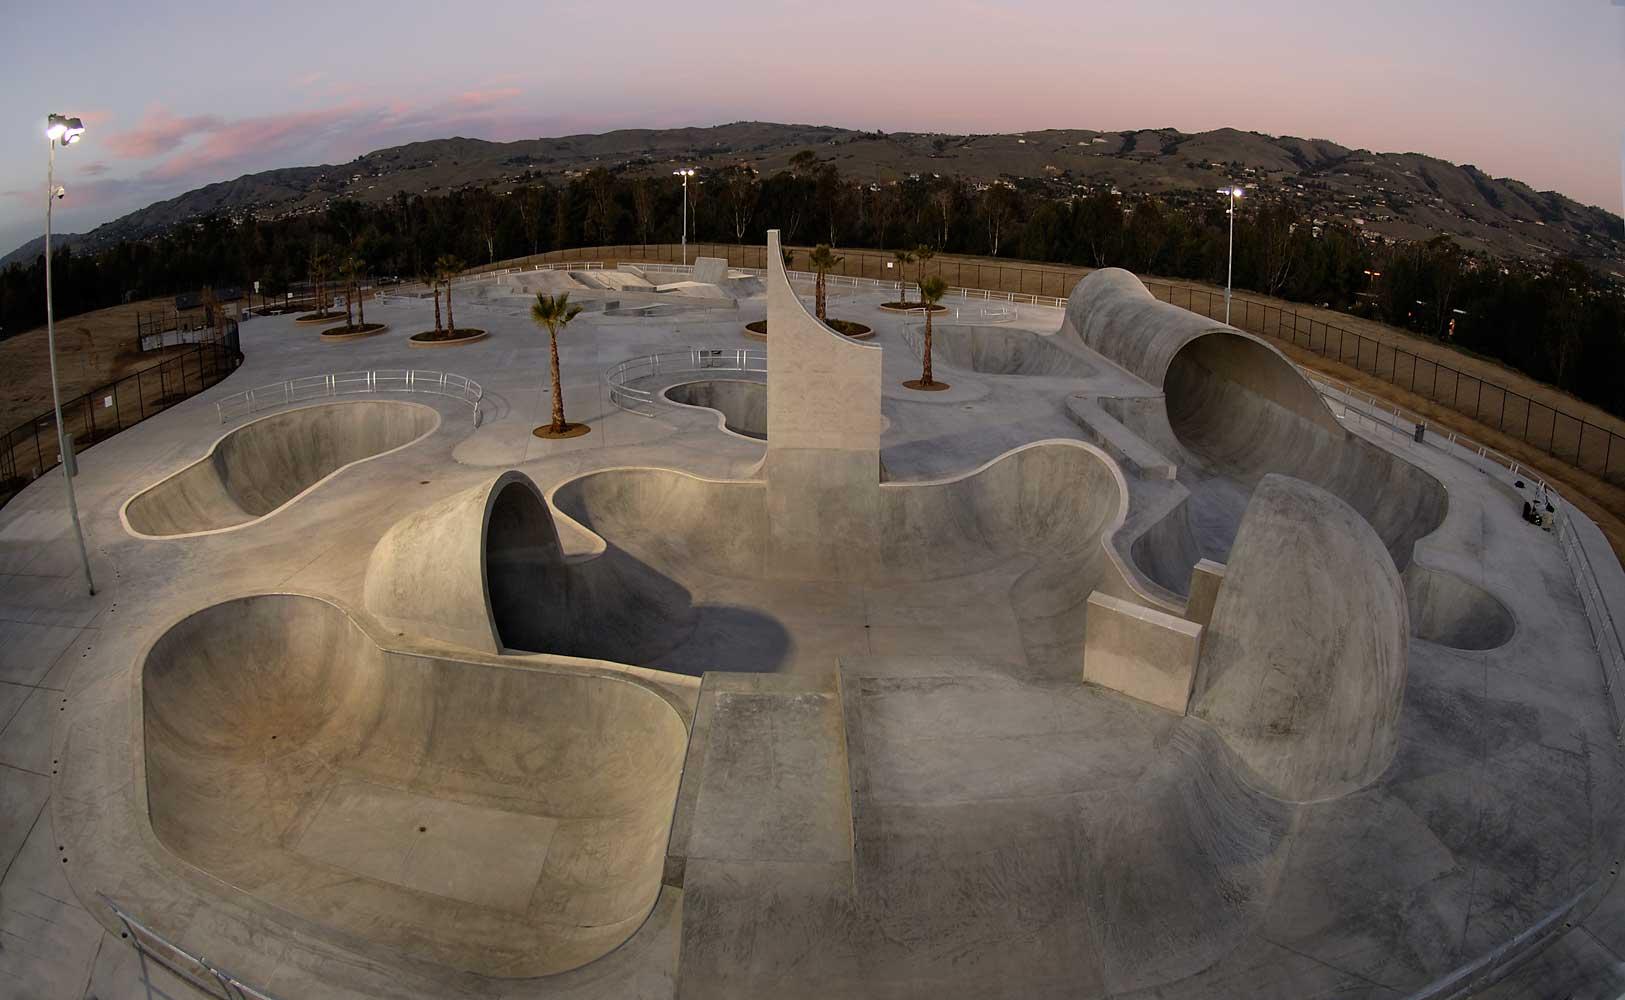 San-Jose-skatepark.jpg.d1fd394544ca43b259e1f1d3c32fee5e.jpg